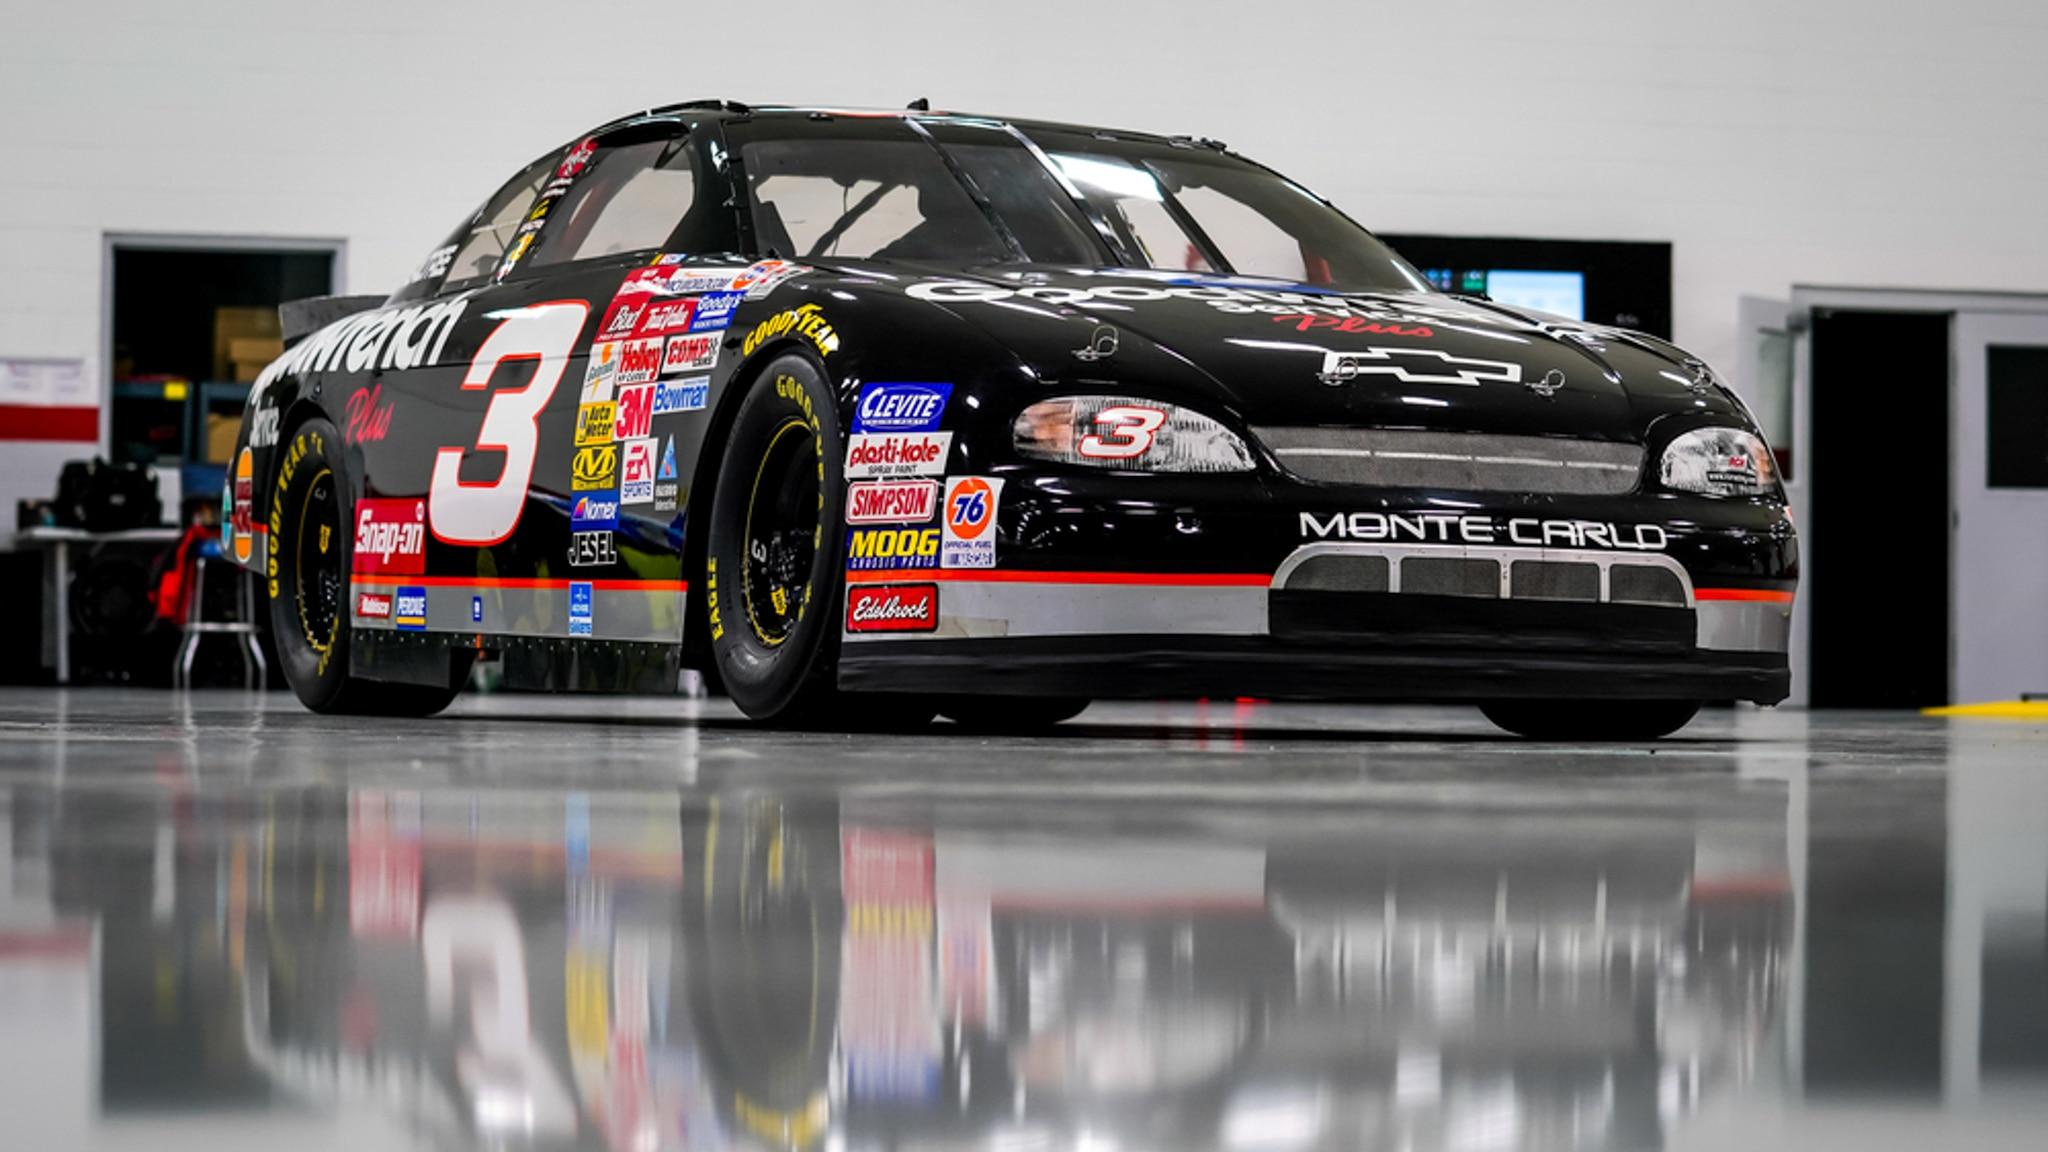 Ex Dale Earnhardt Nascar Racer Brings 425k At Barrett Jackson Online Auction